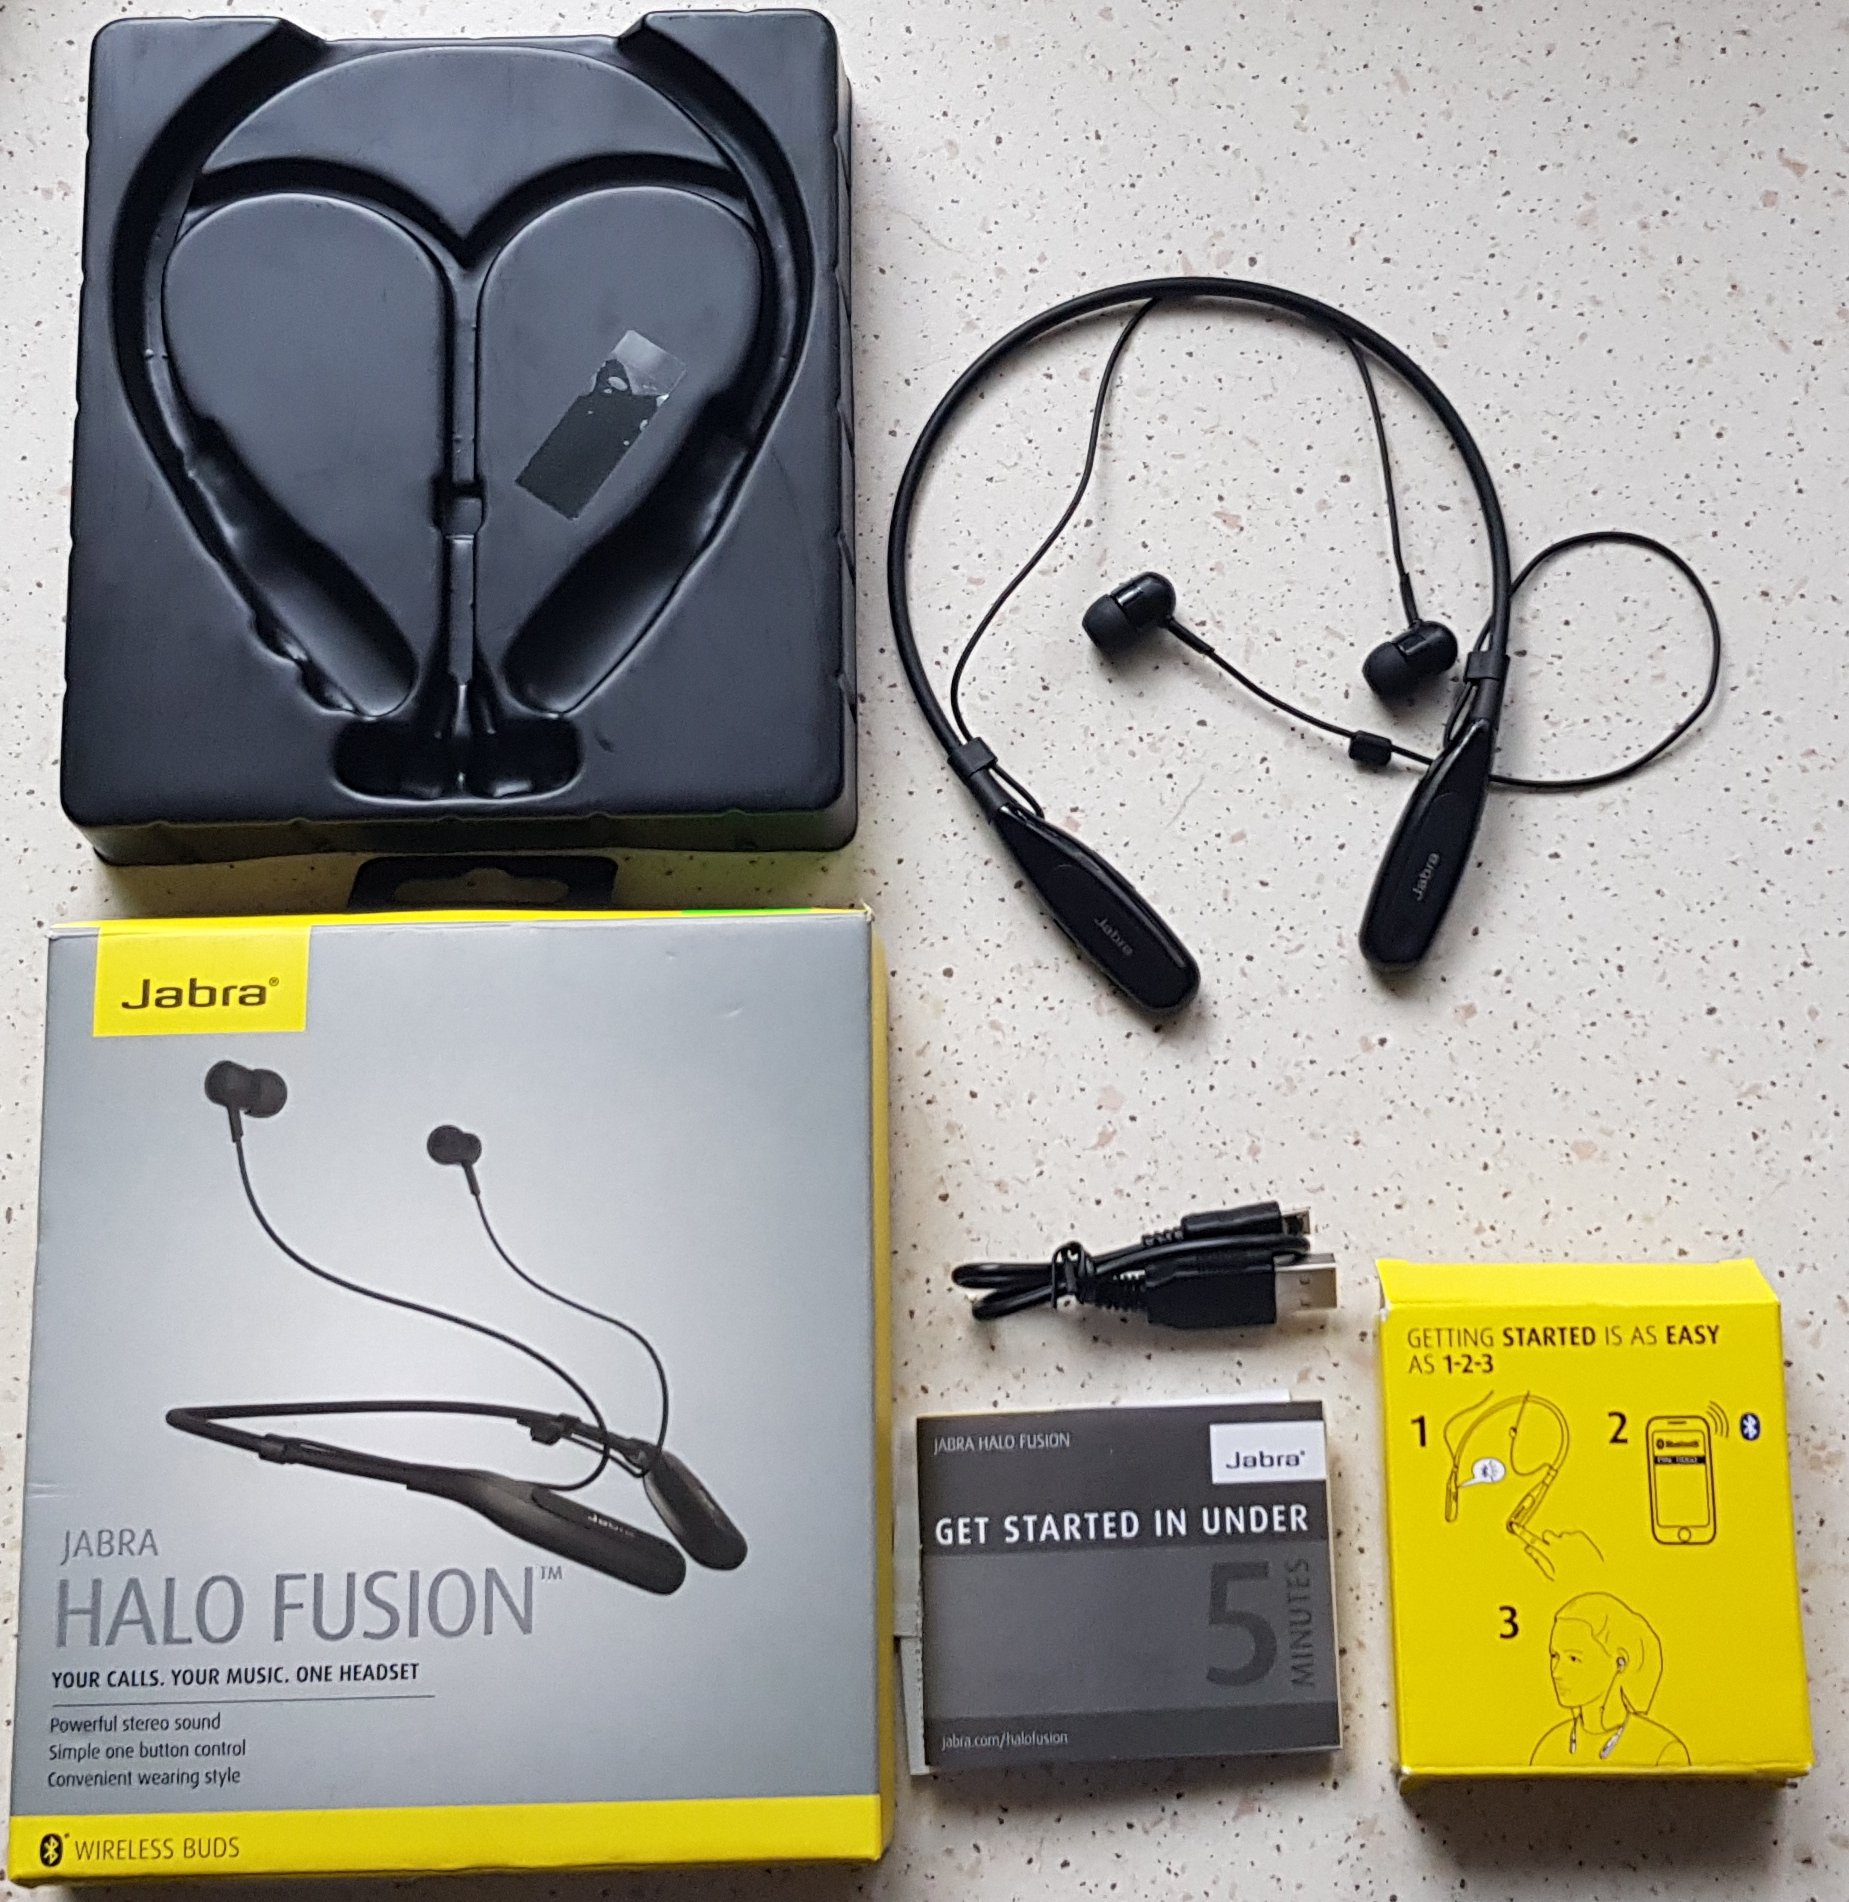 Jabra Halo Fusion Suchawki Wireless Bluetooth 7204099542 Black